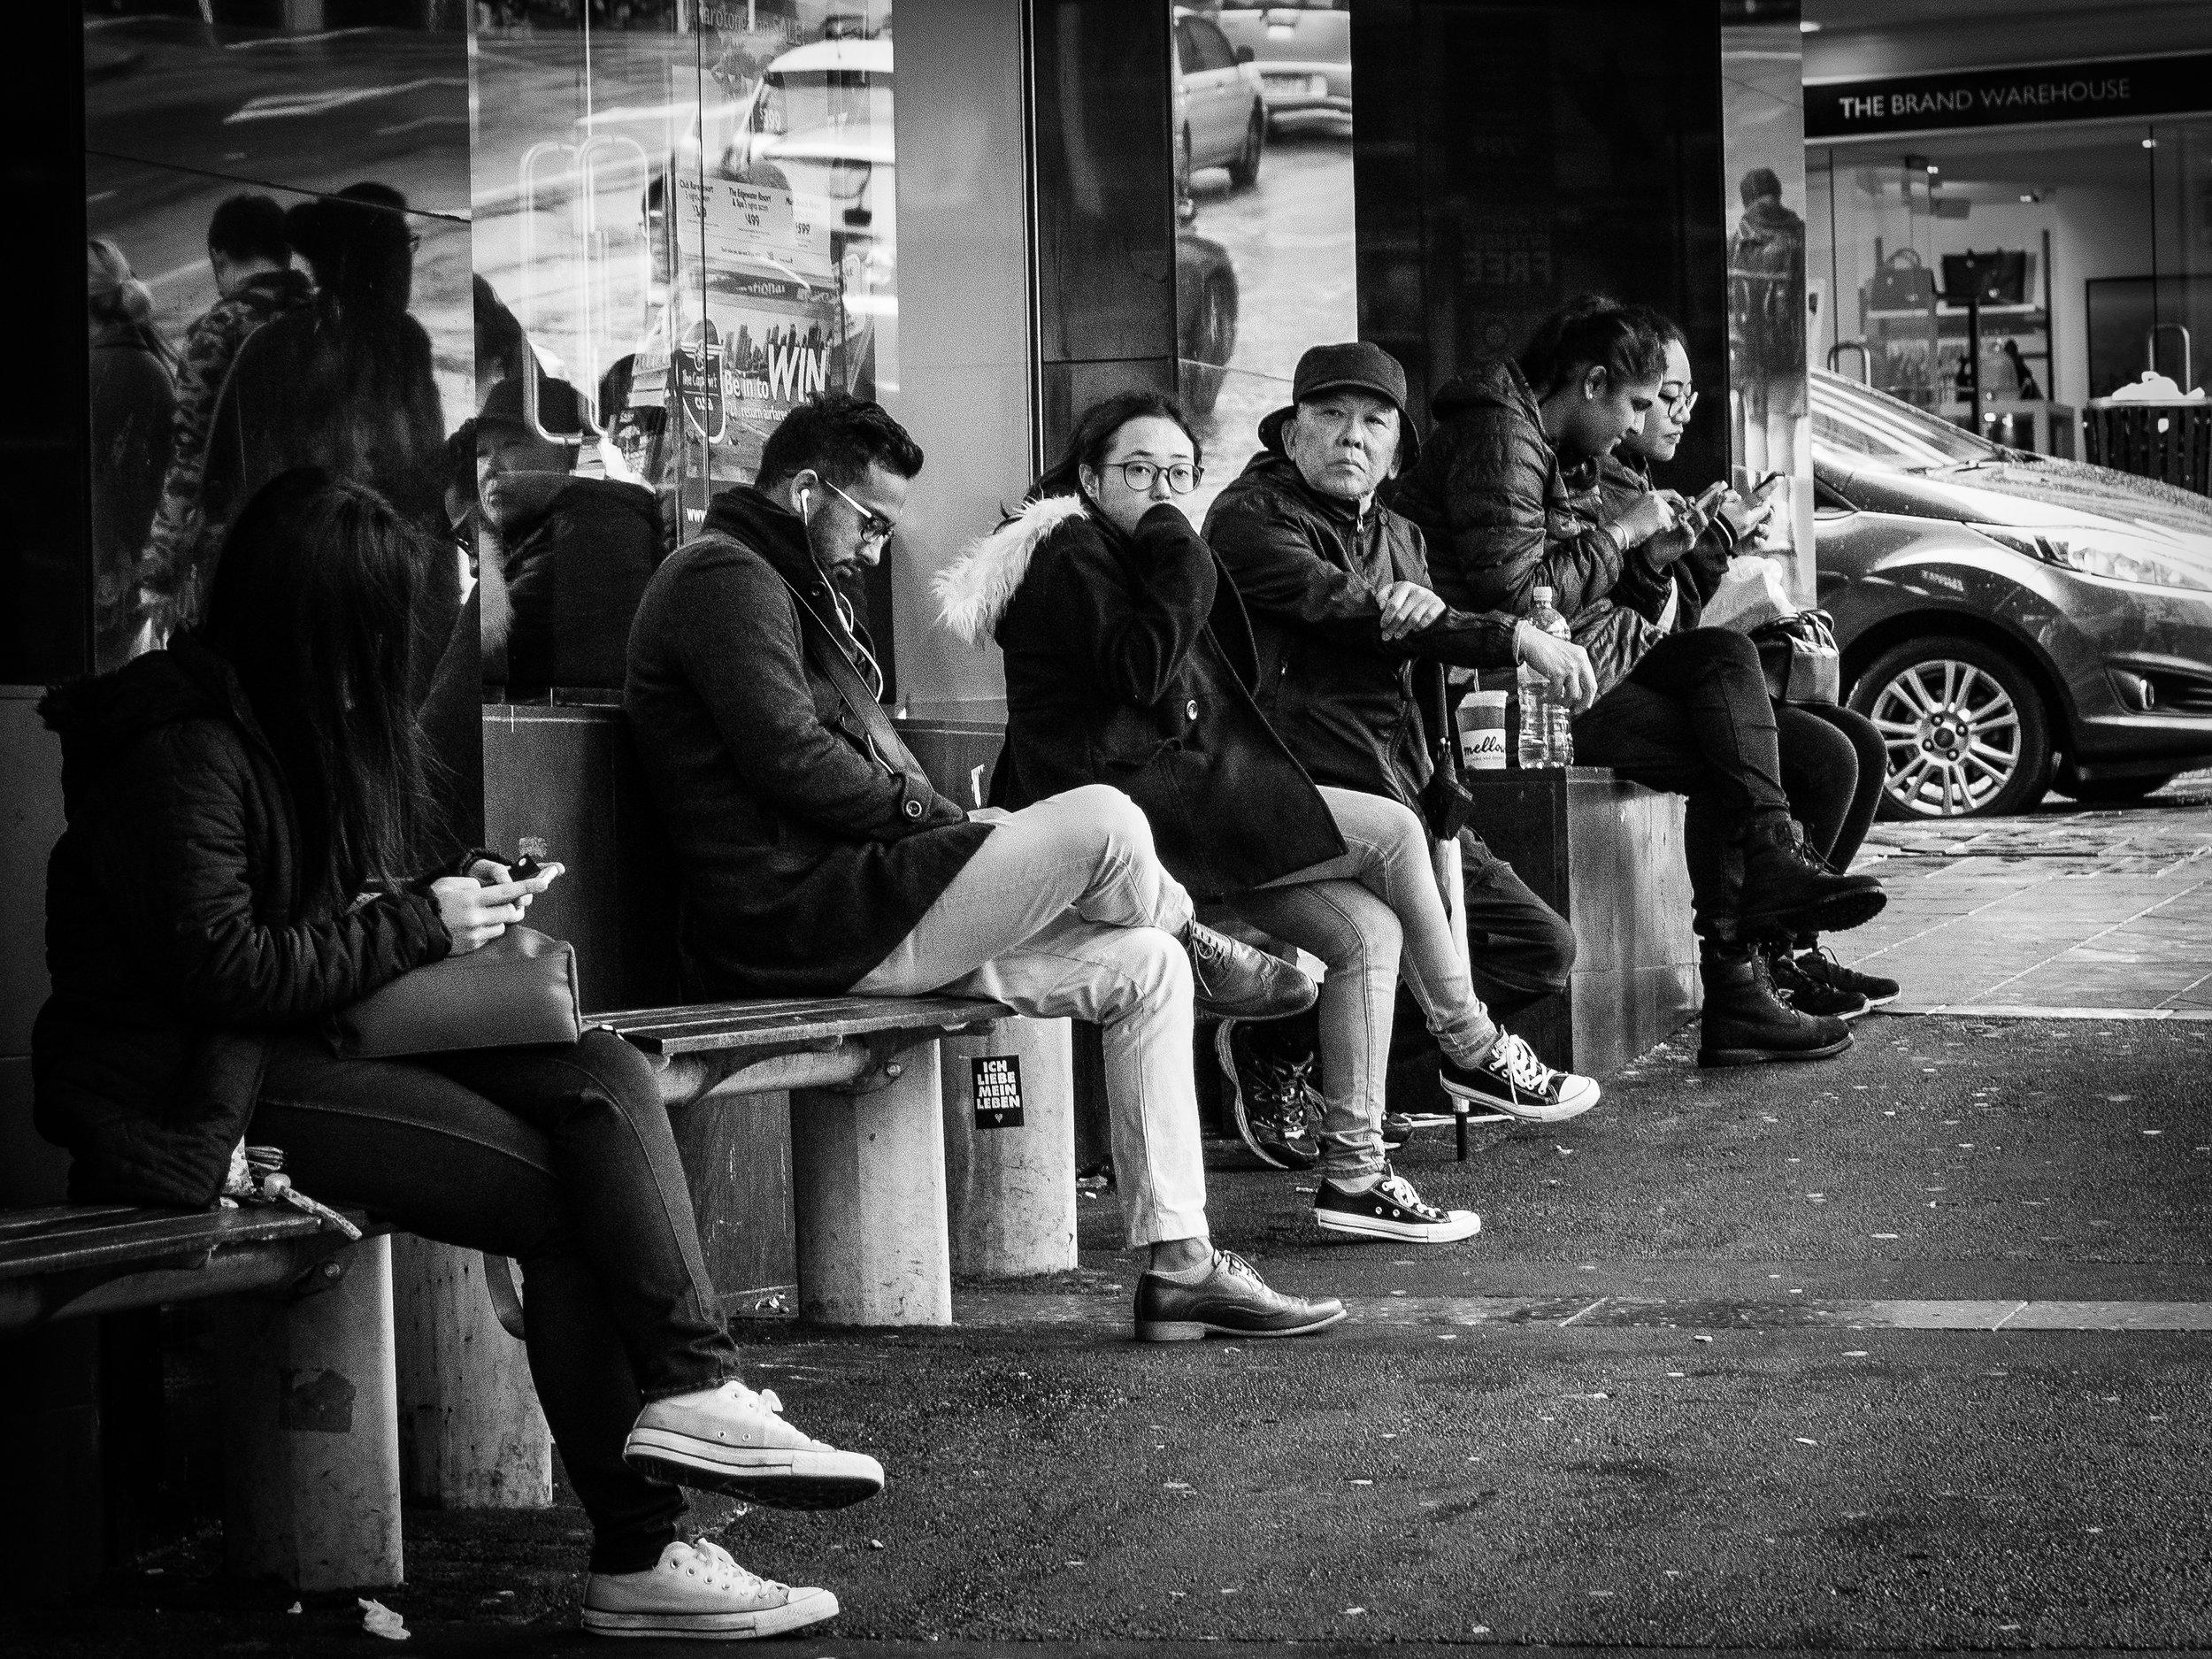 Waiting for the bus - Auckland CBD.jpg